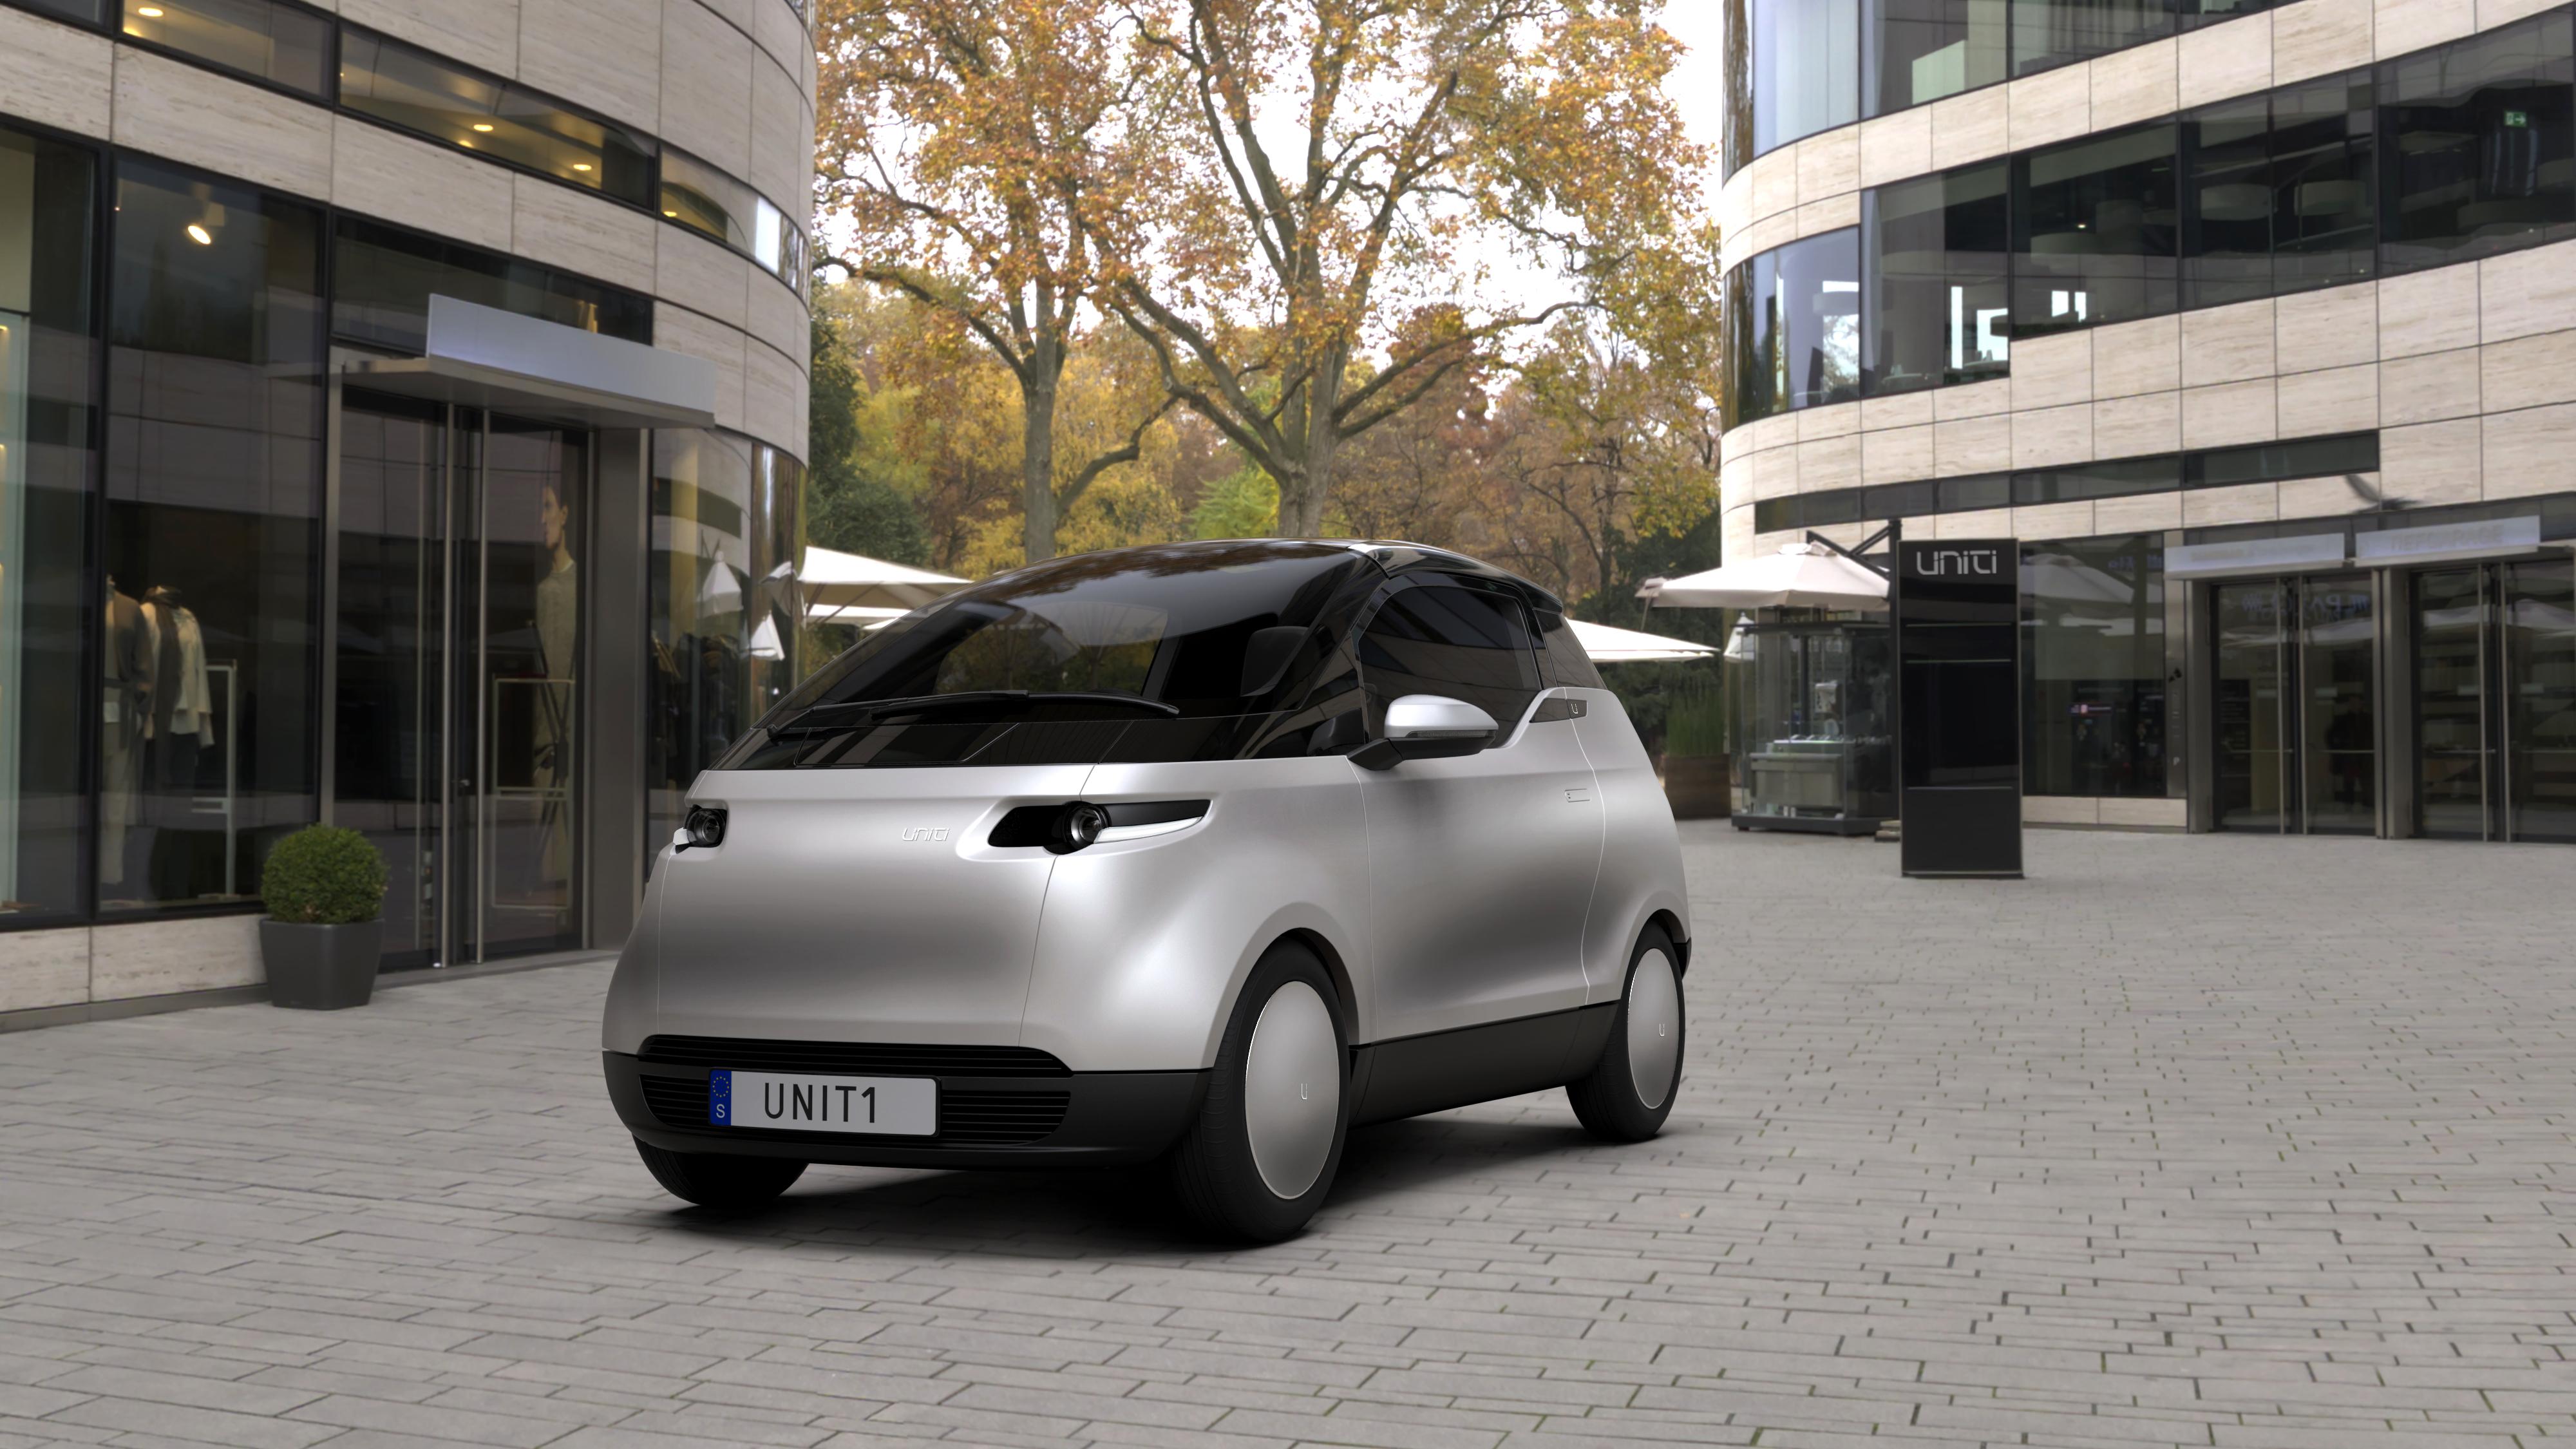 Sweden's Uniti electric city car gets a £15K price tag